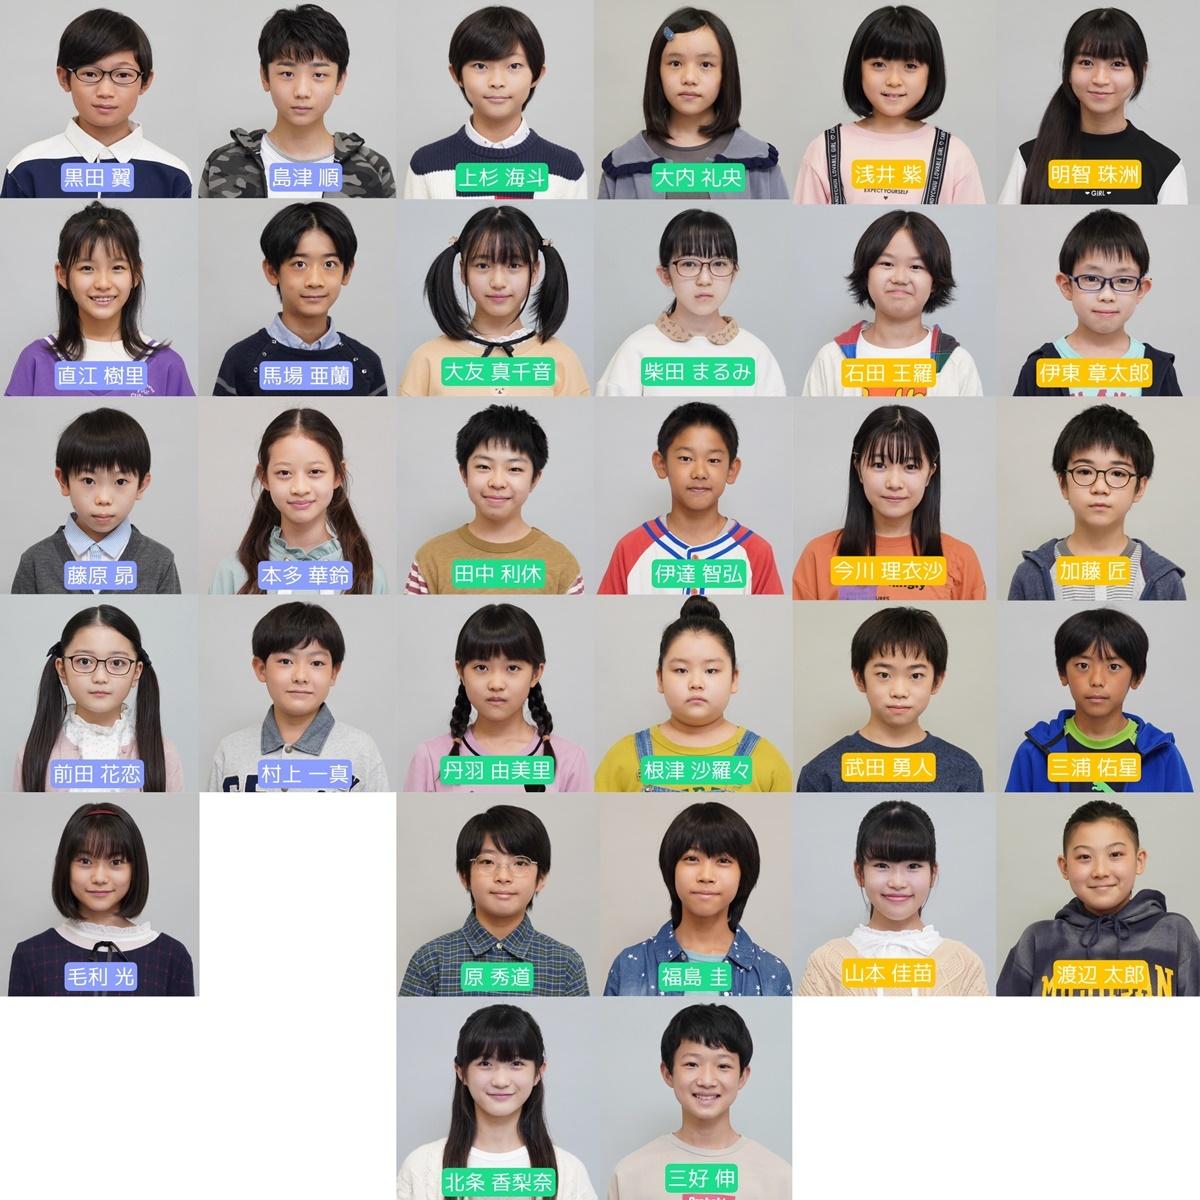 https://news.mynavi.jp/article/20210924-1981056/images/001l.jpg